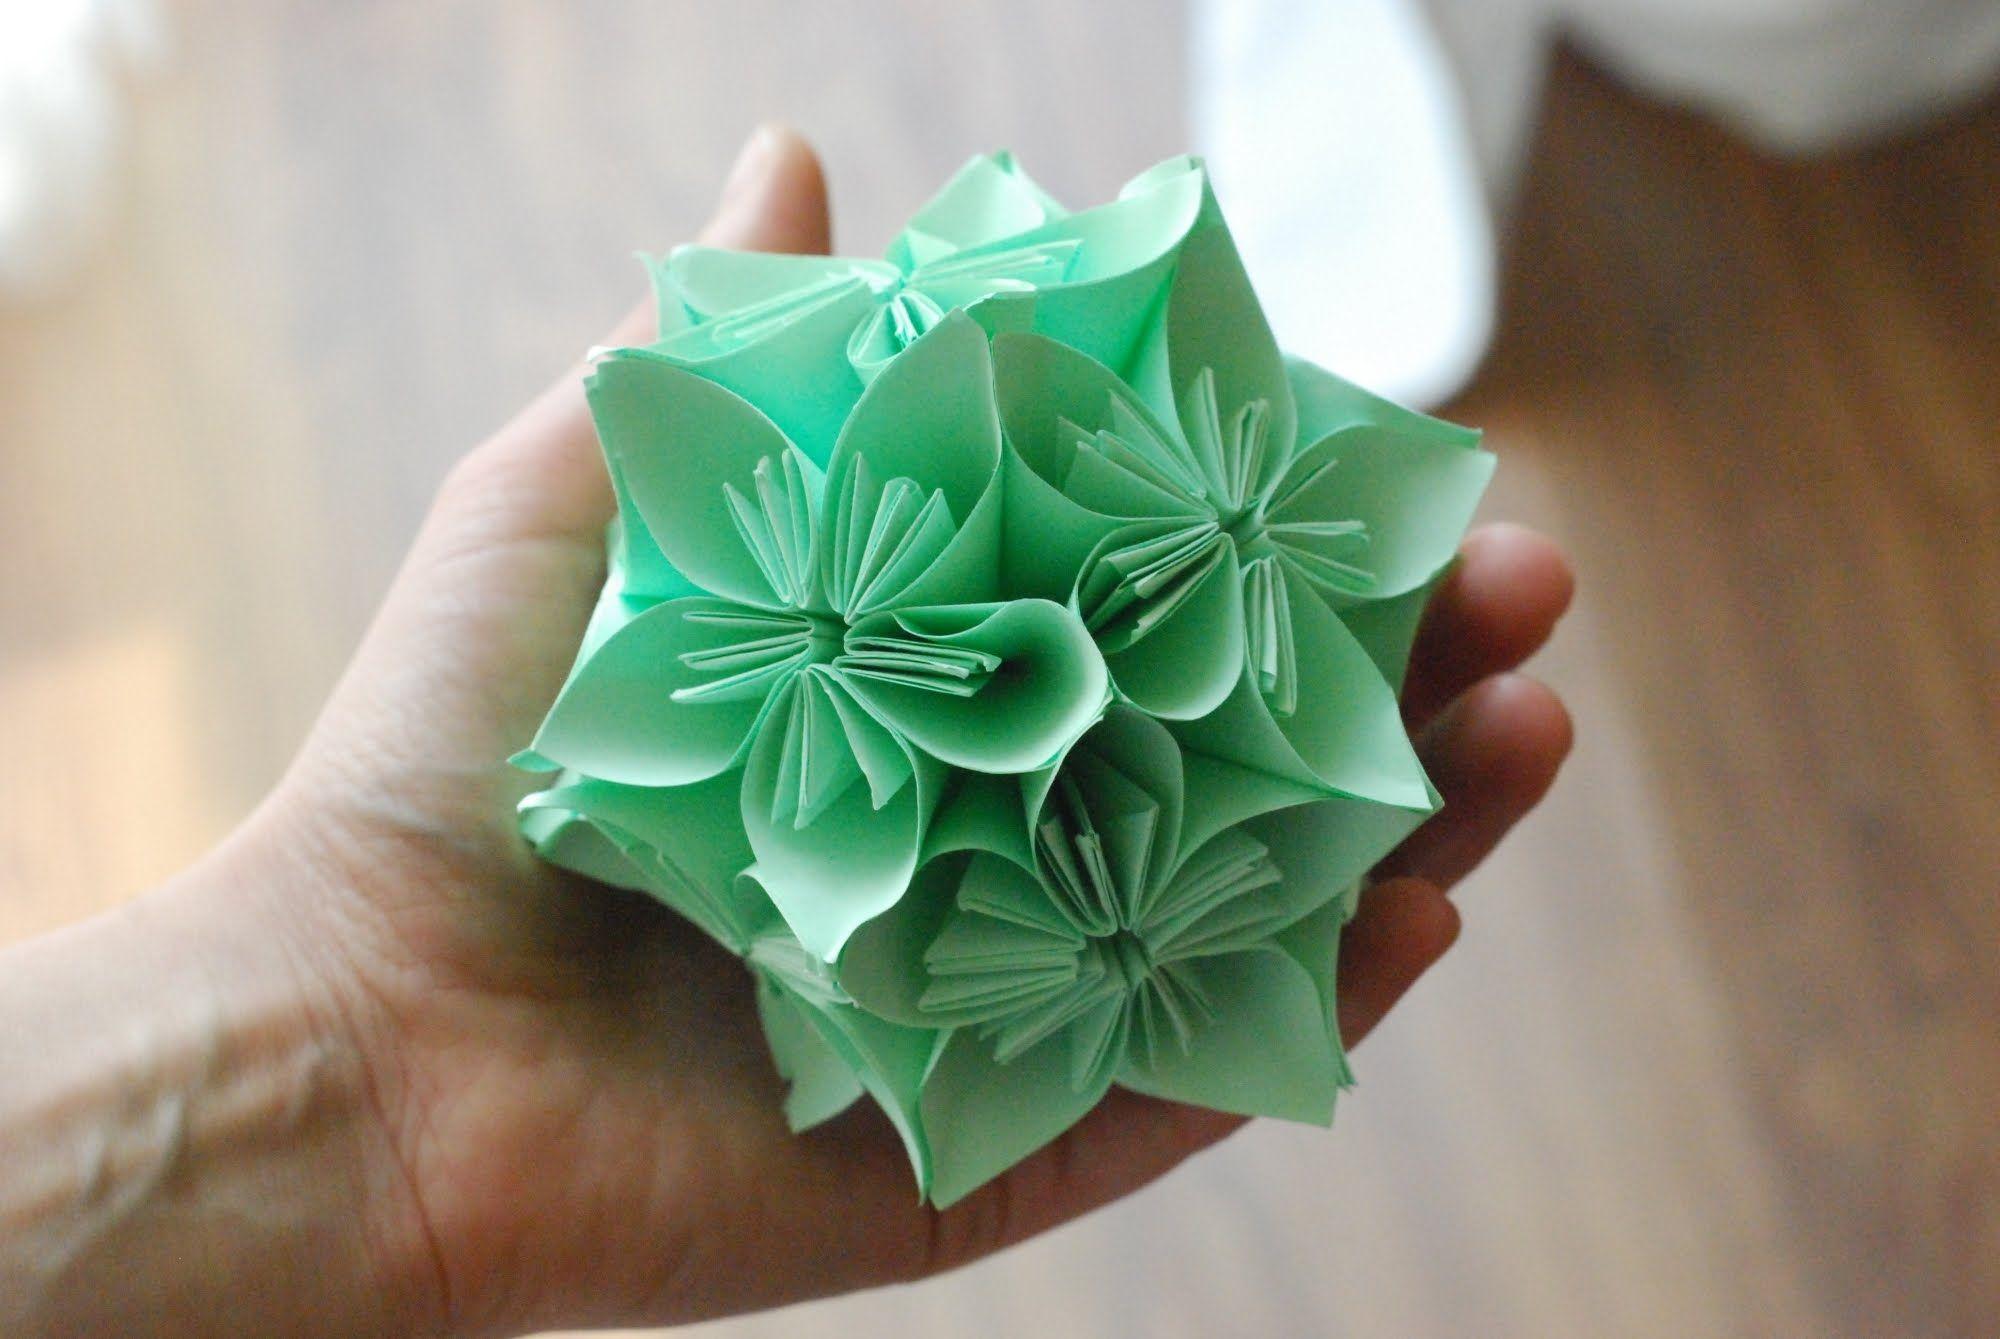 Jak Zrobic Kule Kusudama How To Make A Kusudama Ball Origami Origami Techniques Crafts